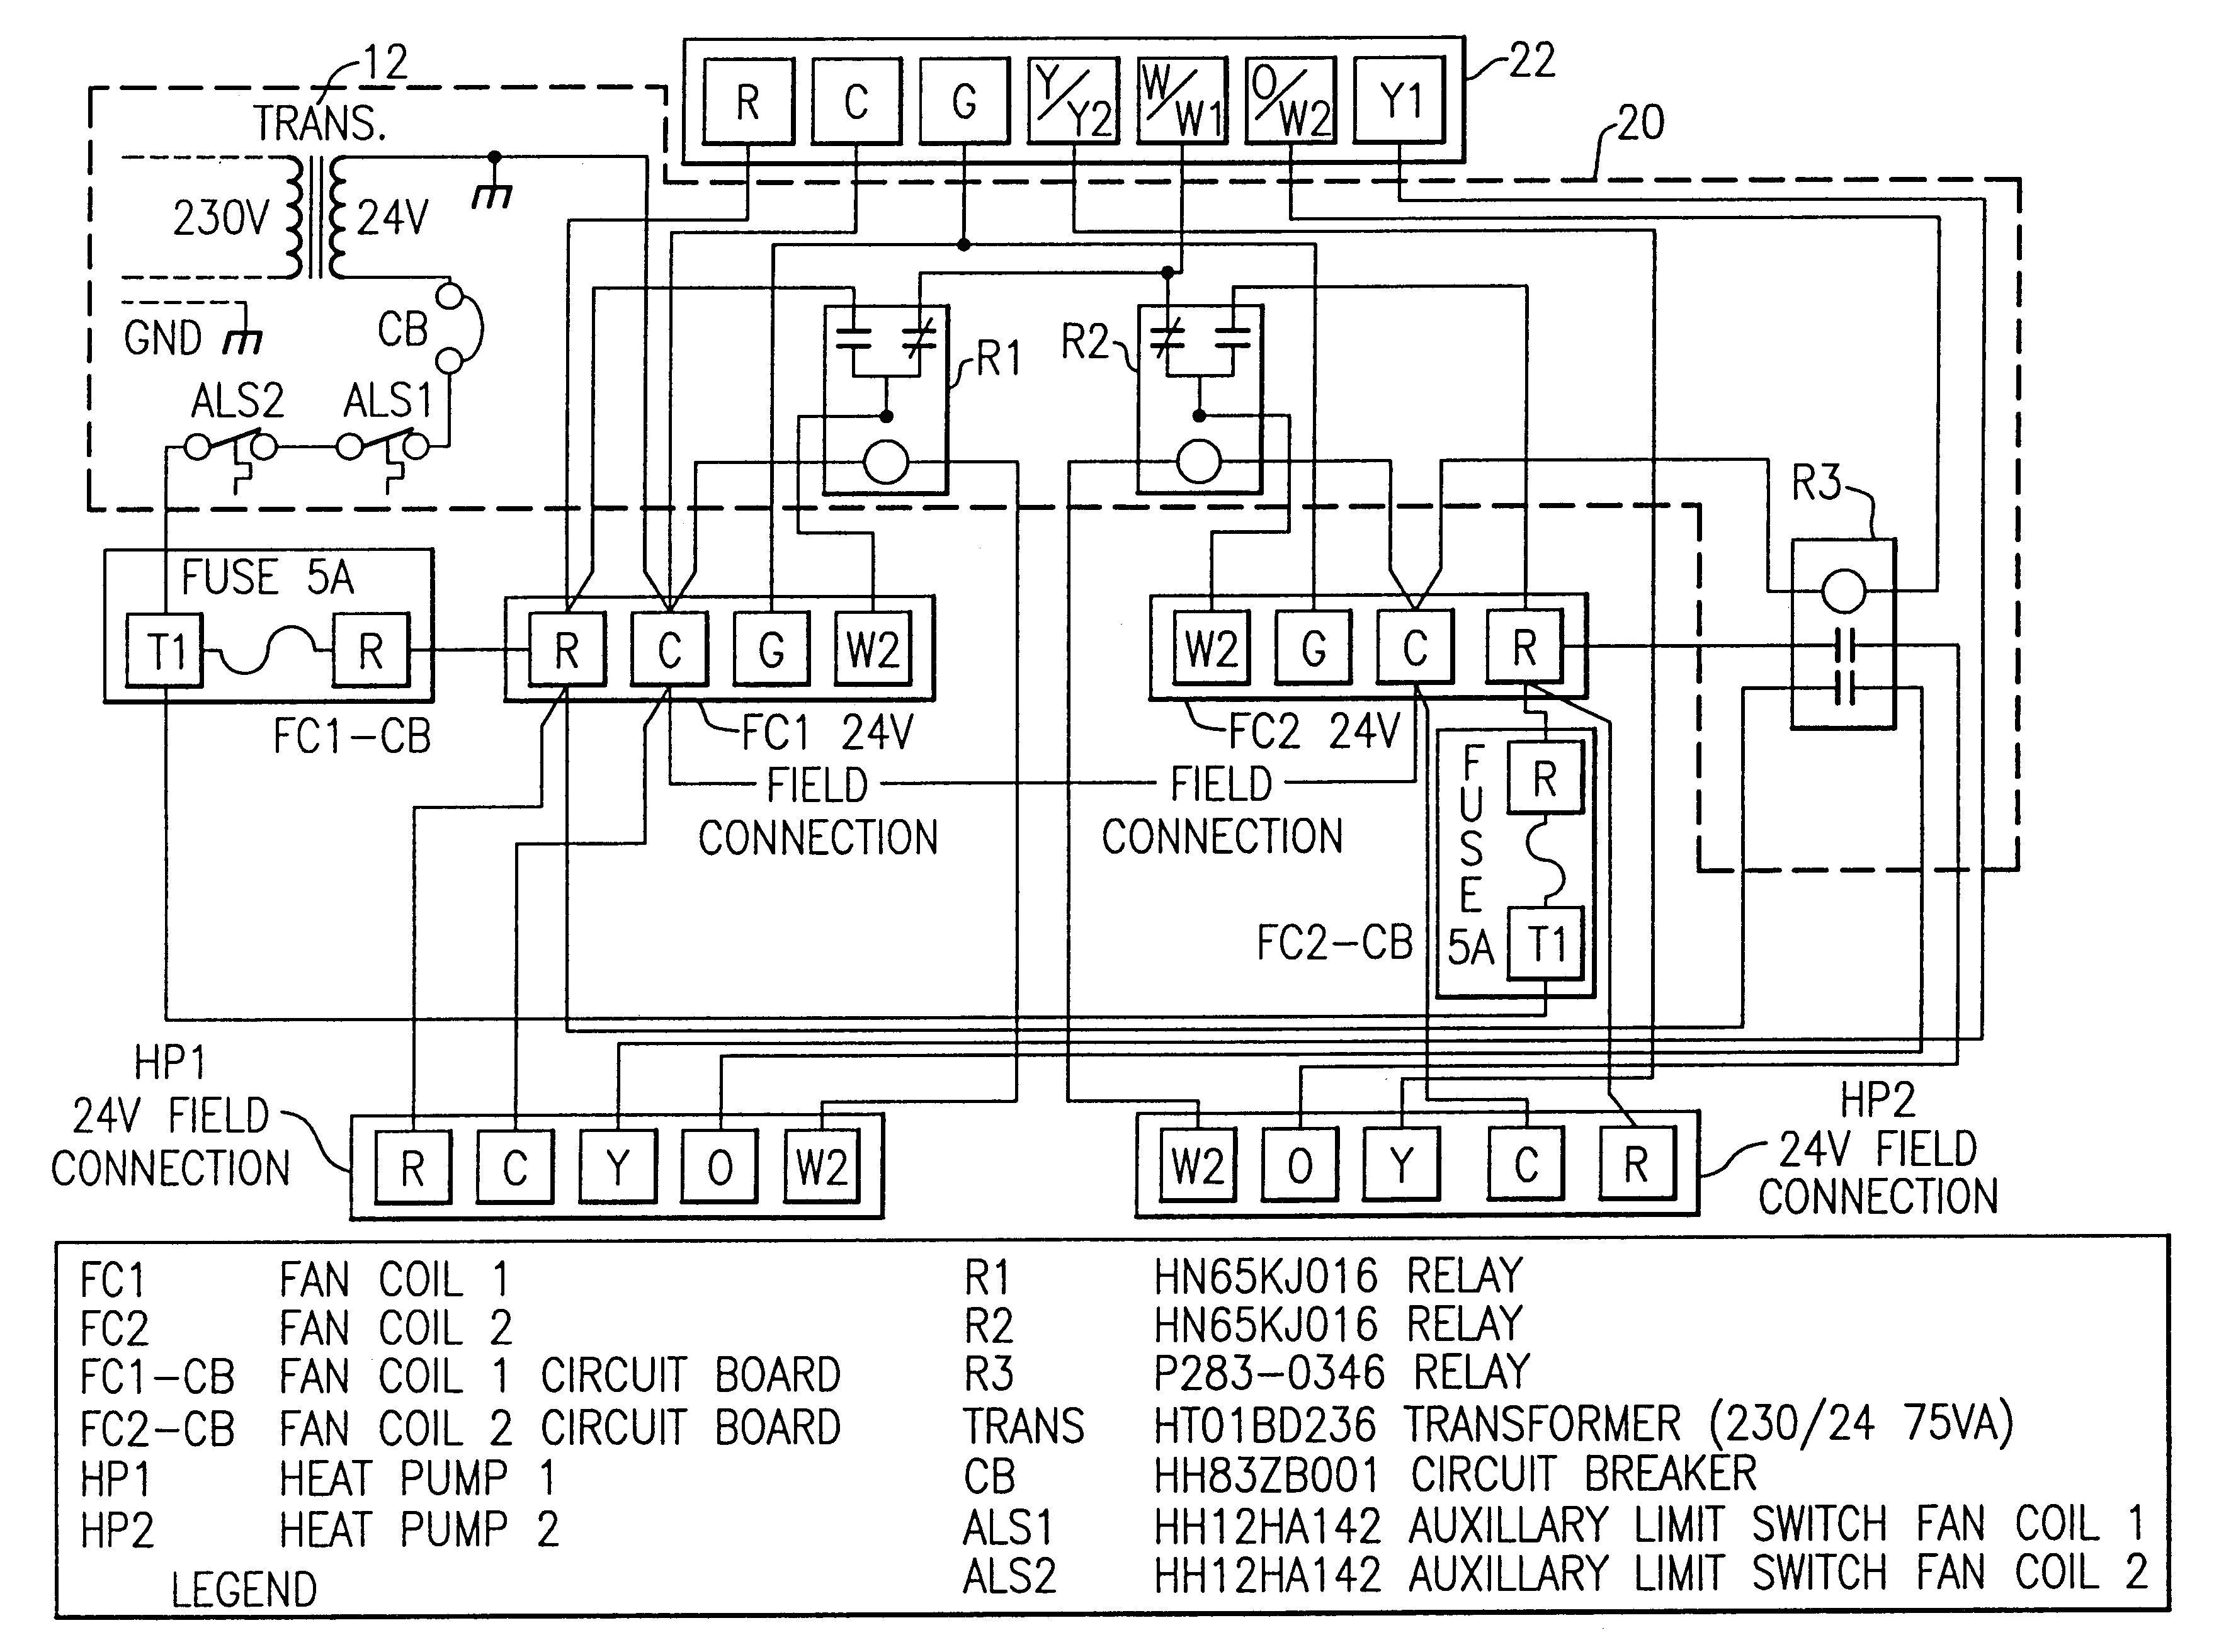 American Standard Furnace Wiring Diagram In 2020 American Standard Diagram Furnace